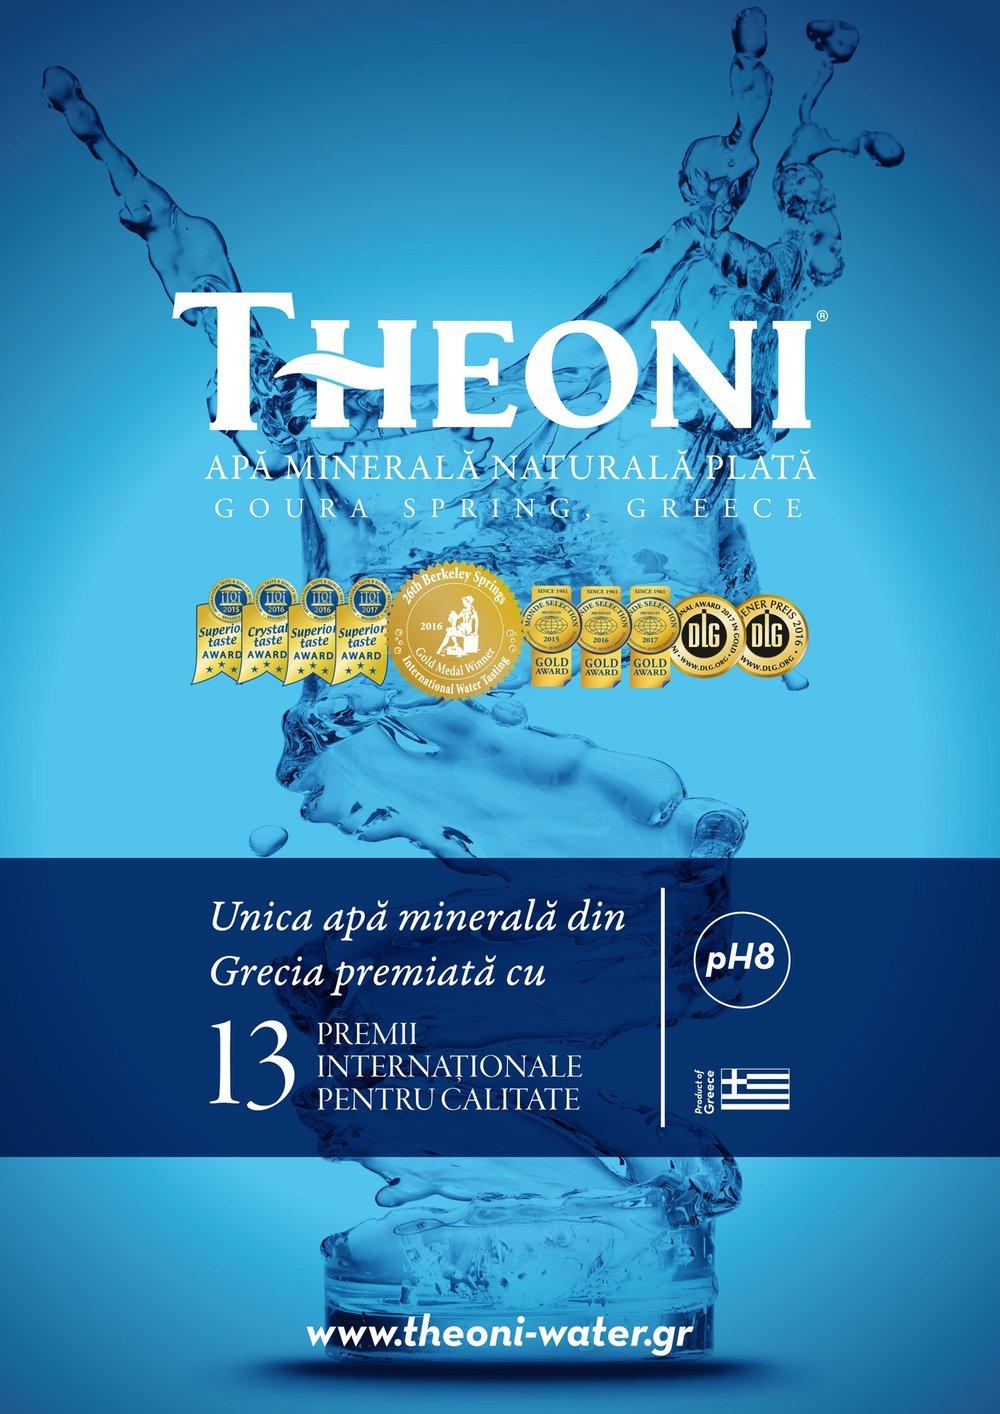 theoni-4-web.jpg